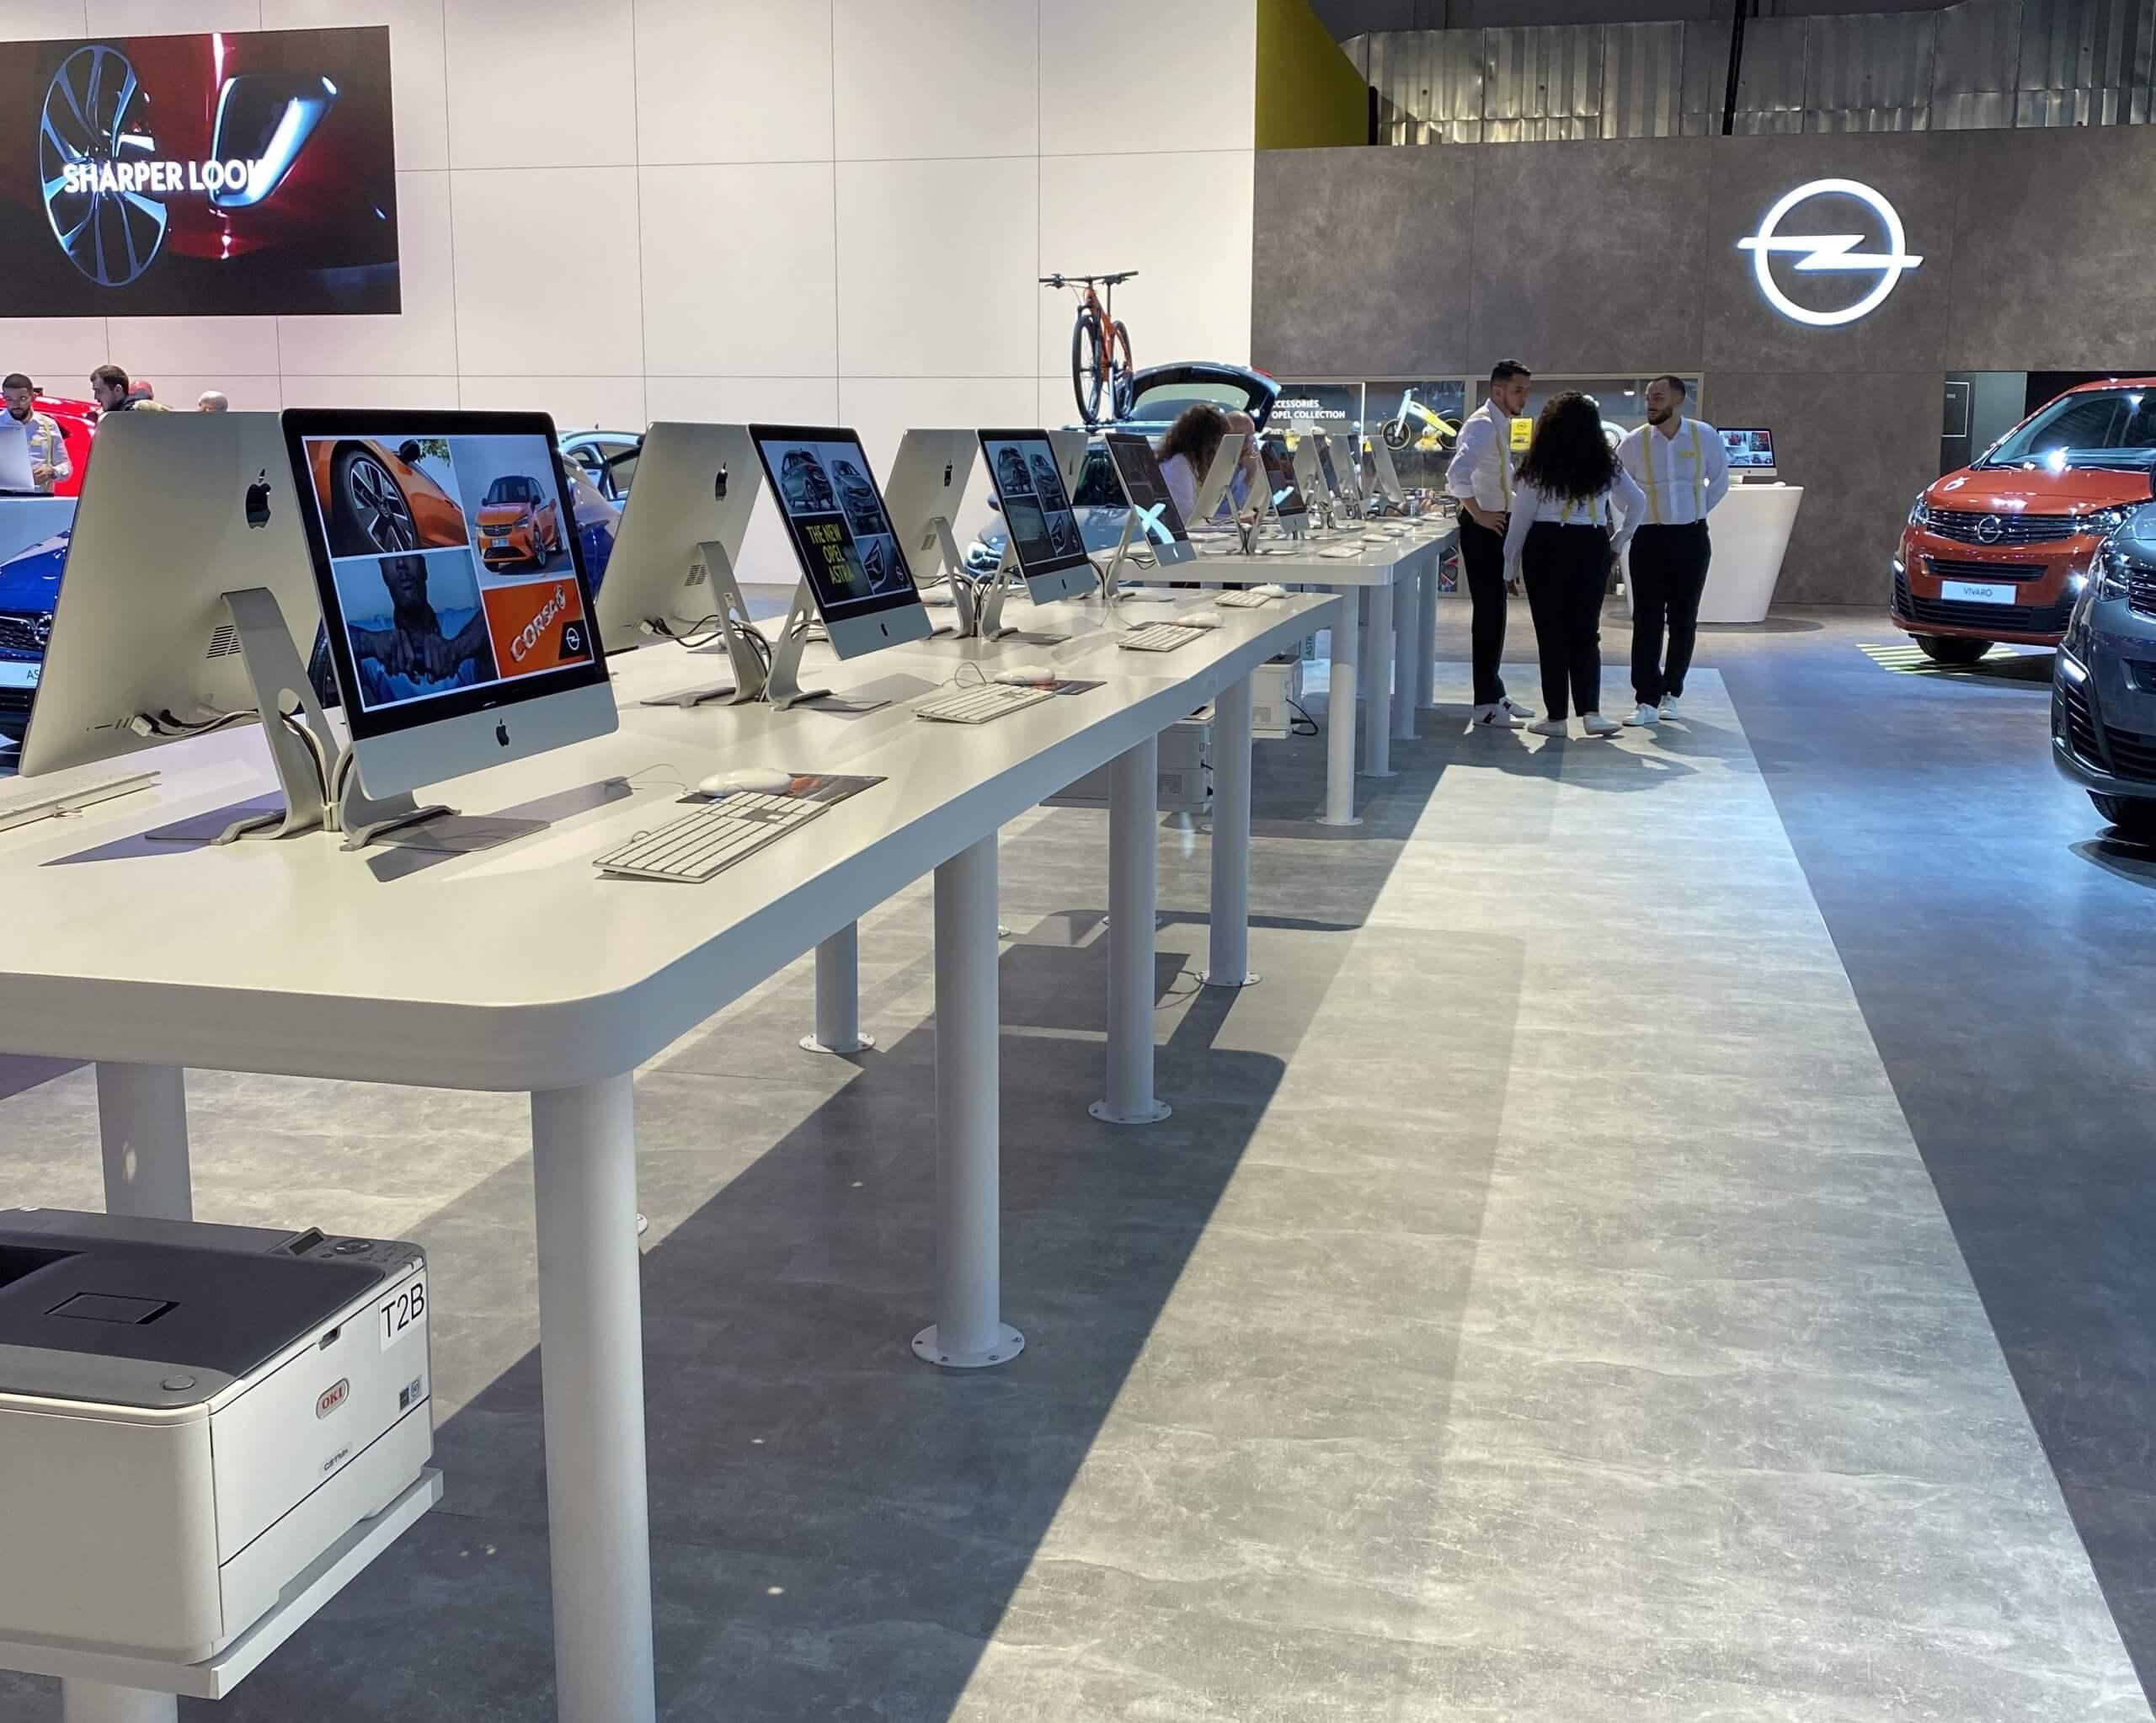 brussels motorshow opel corsa imac apple retail innovation